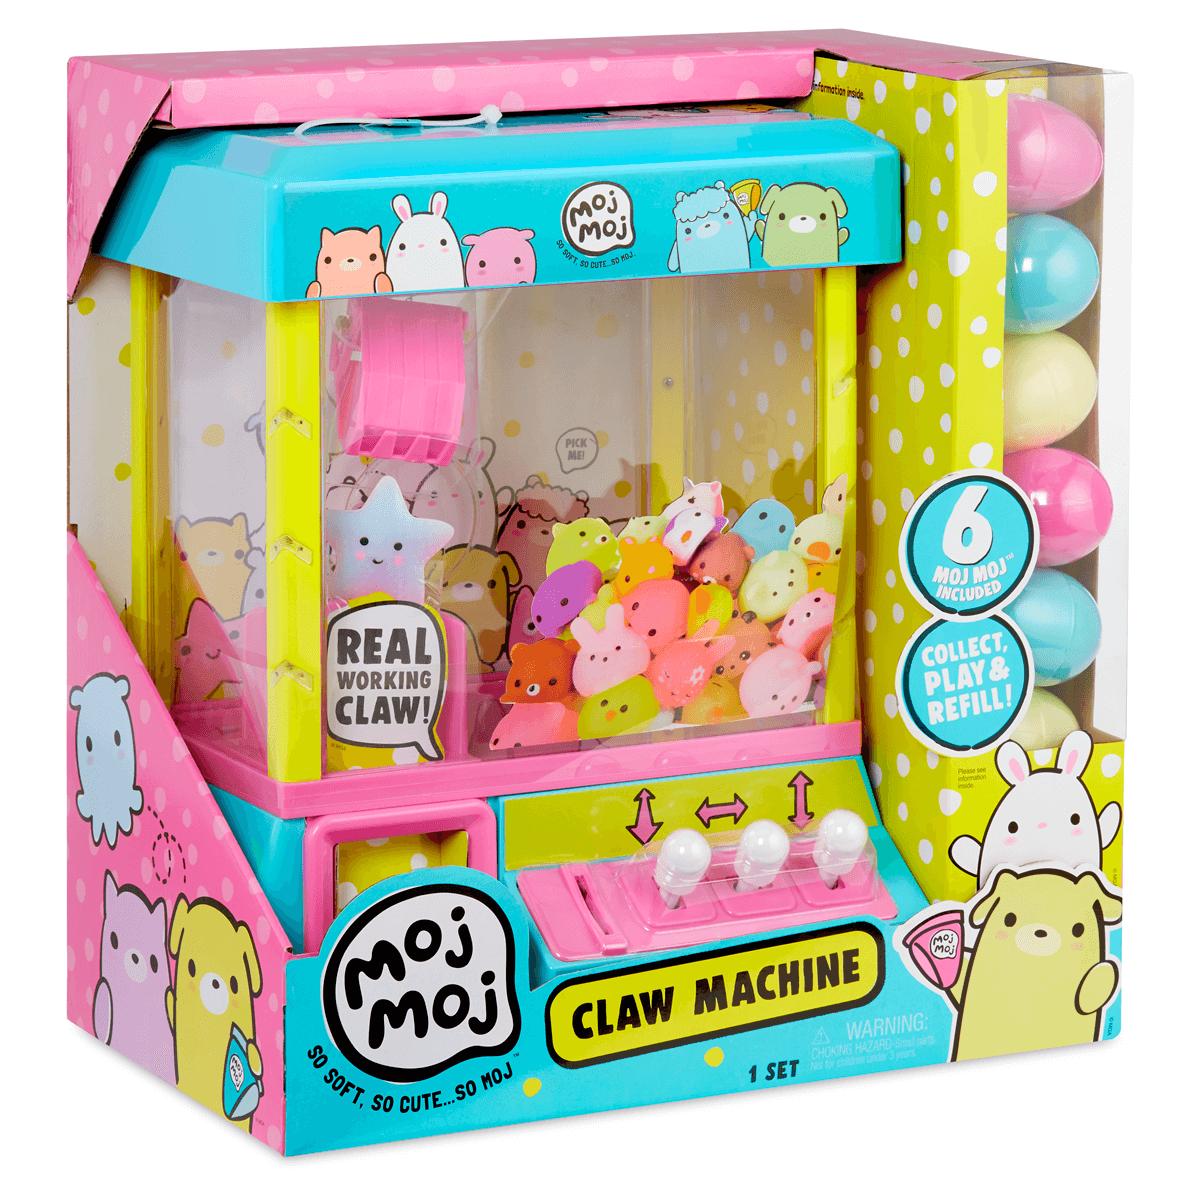 Where Can I Buy Moj Moj Claw Machine